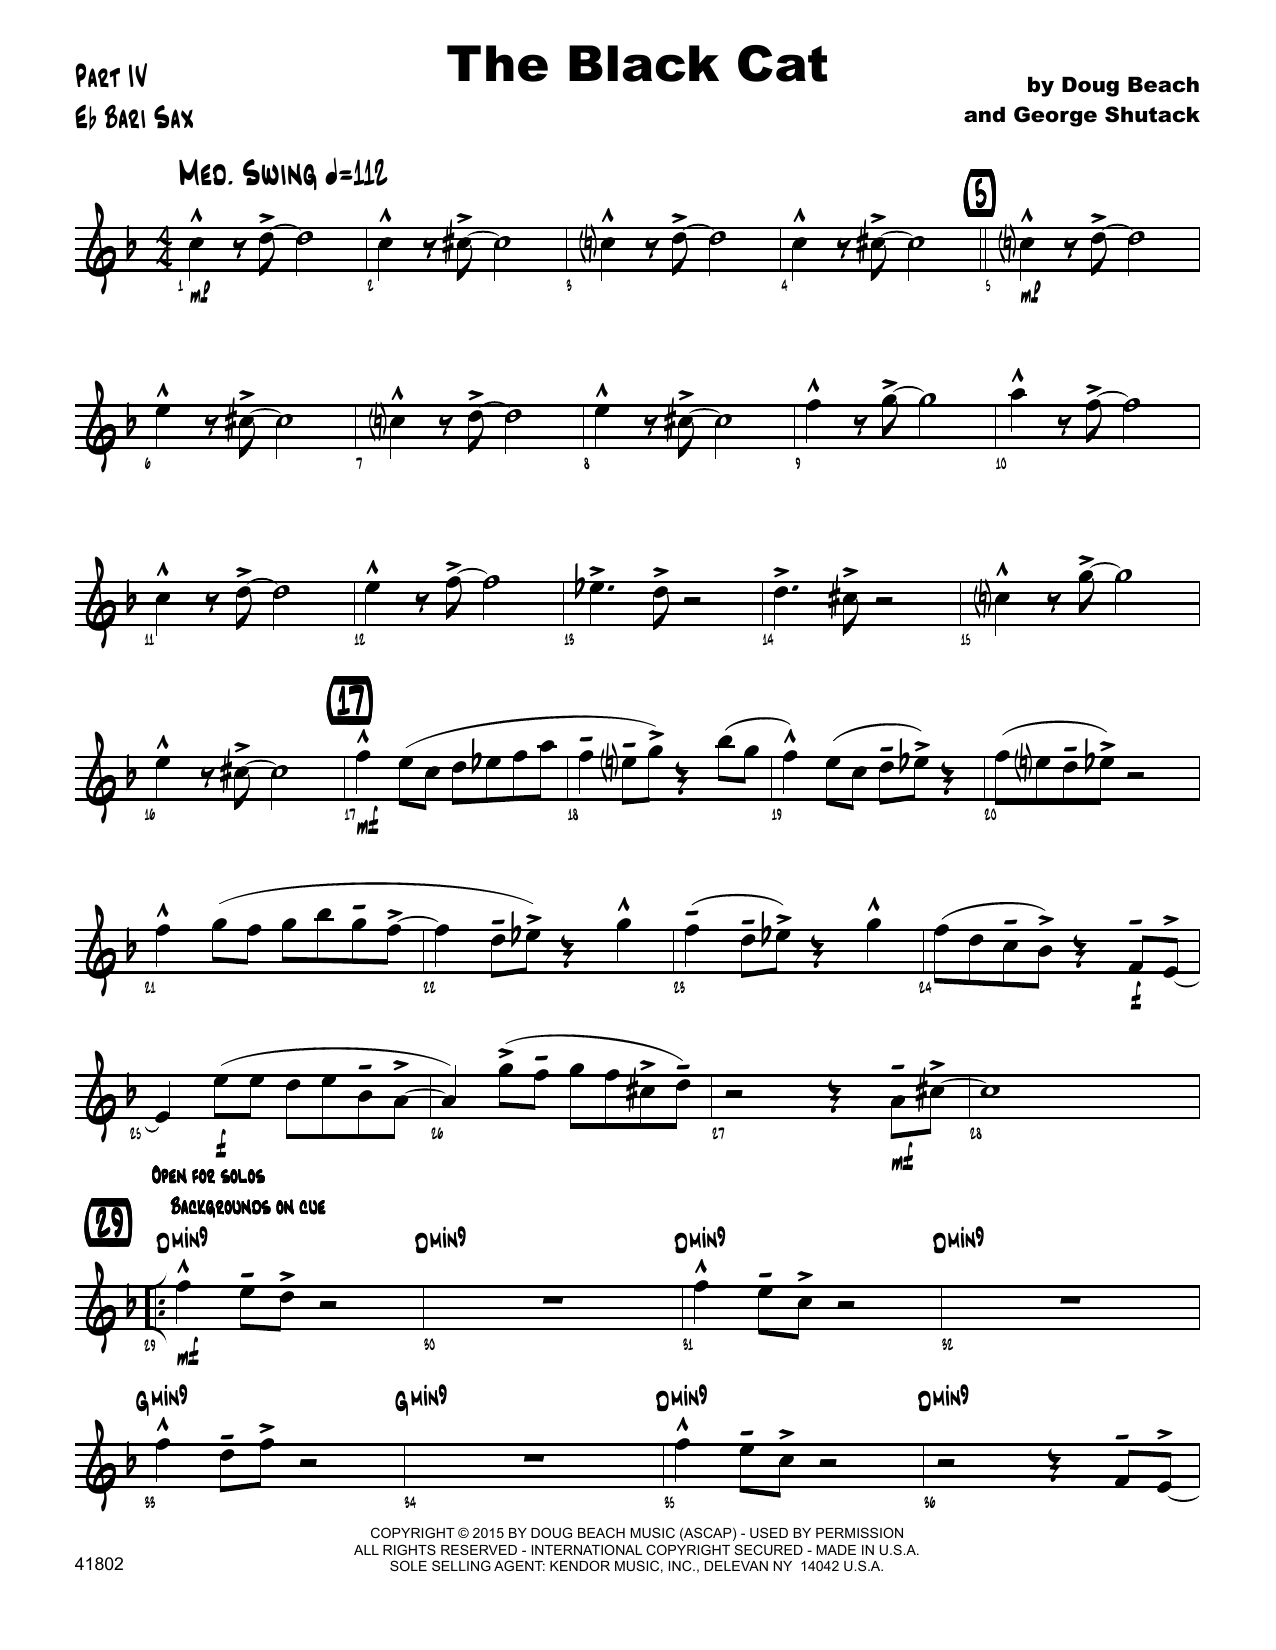 George Shutack - The Black Cat - Eb Baritone Saxophone